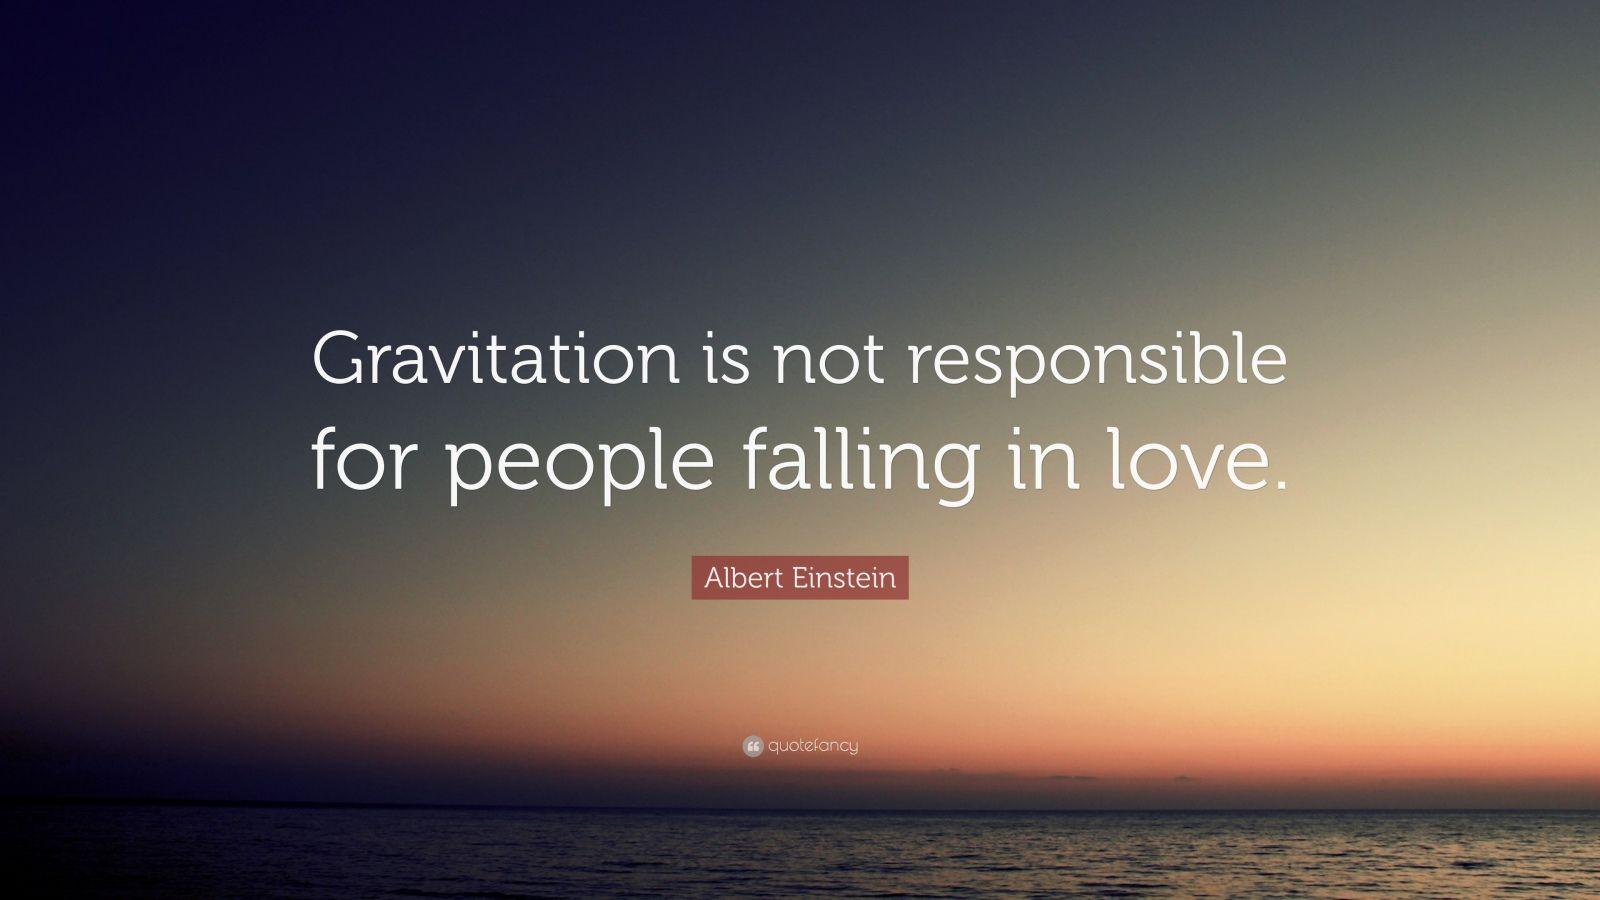 albert einstein quote gravitation is not responsible for